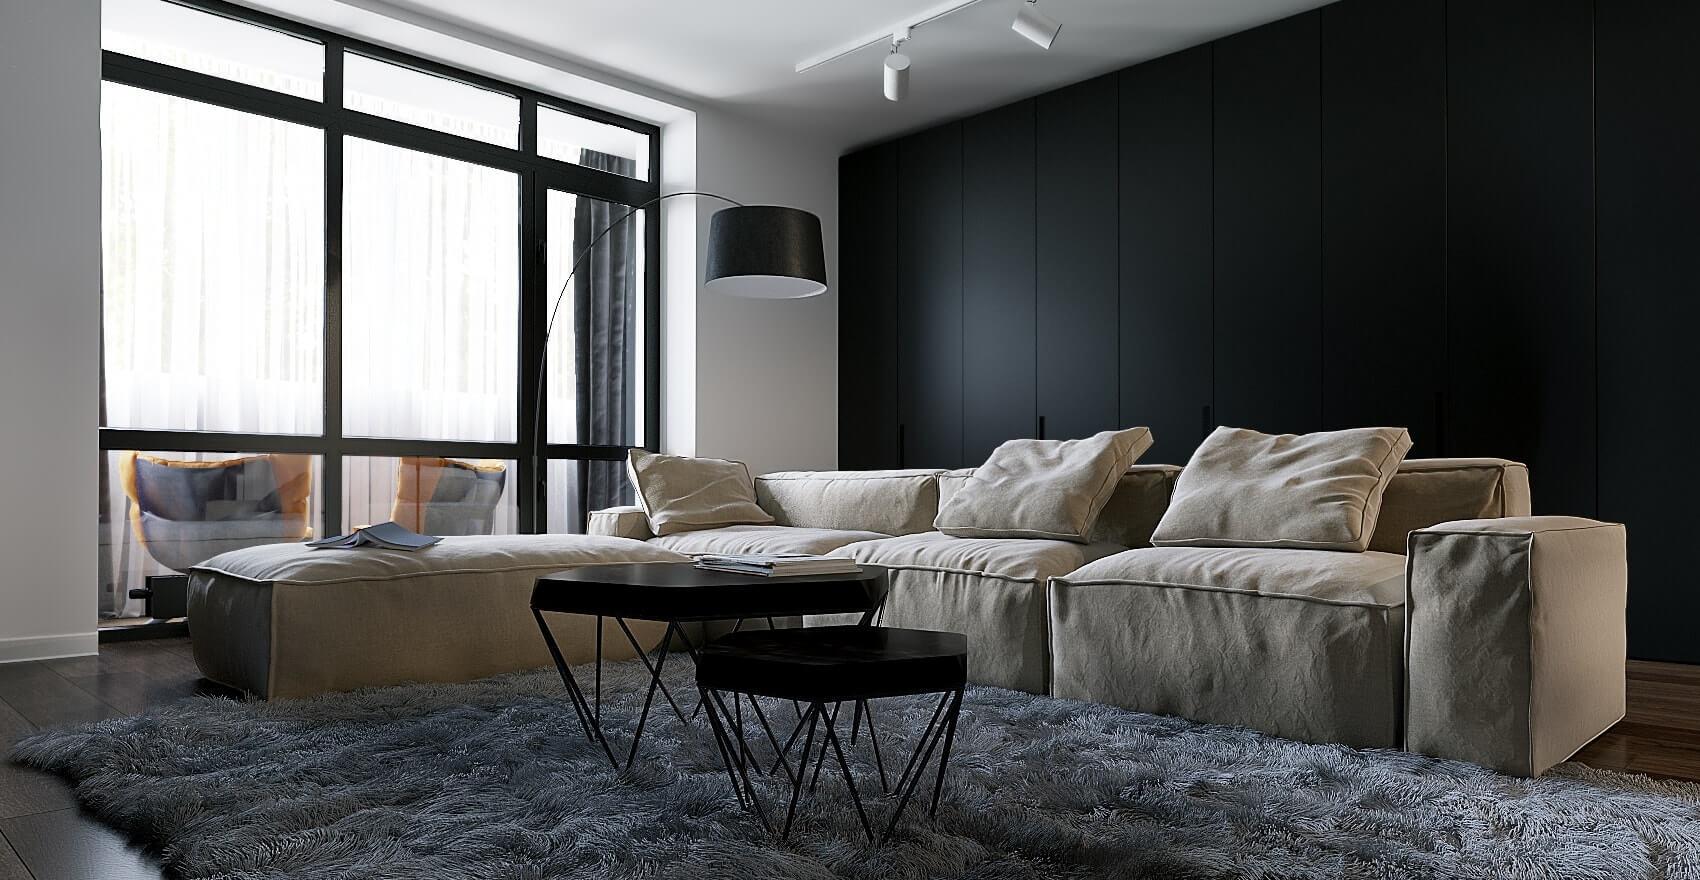 дизайн залы в 2-х комнатной квартире